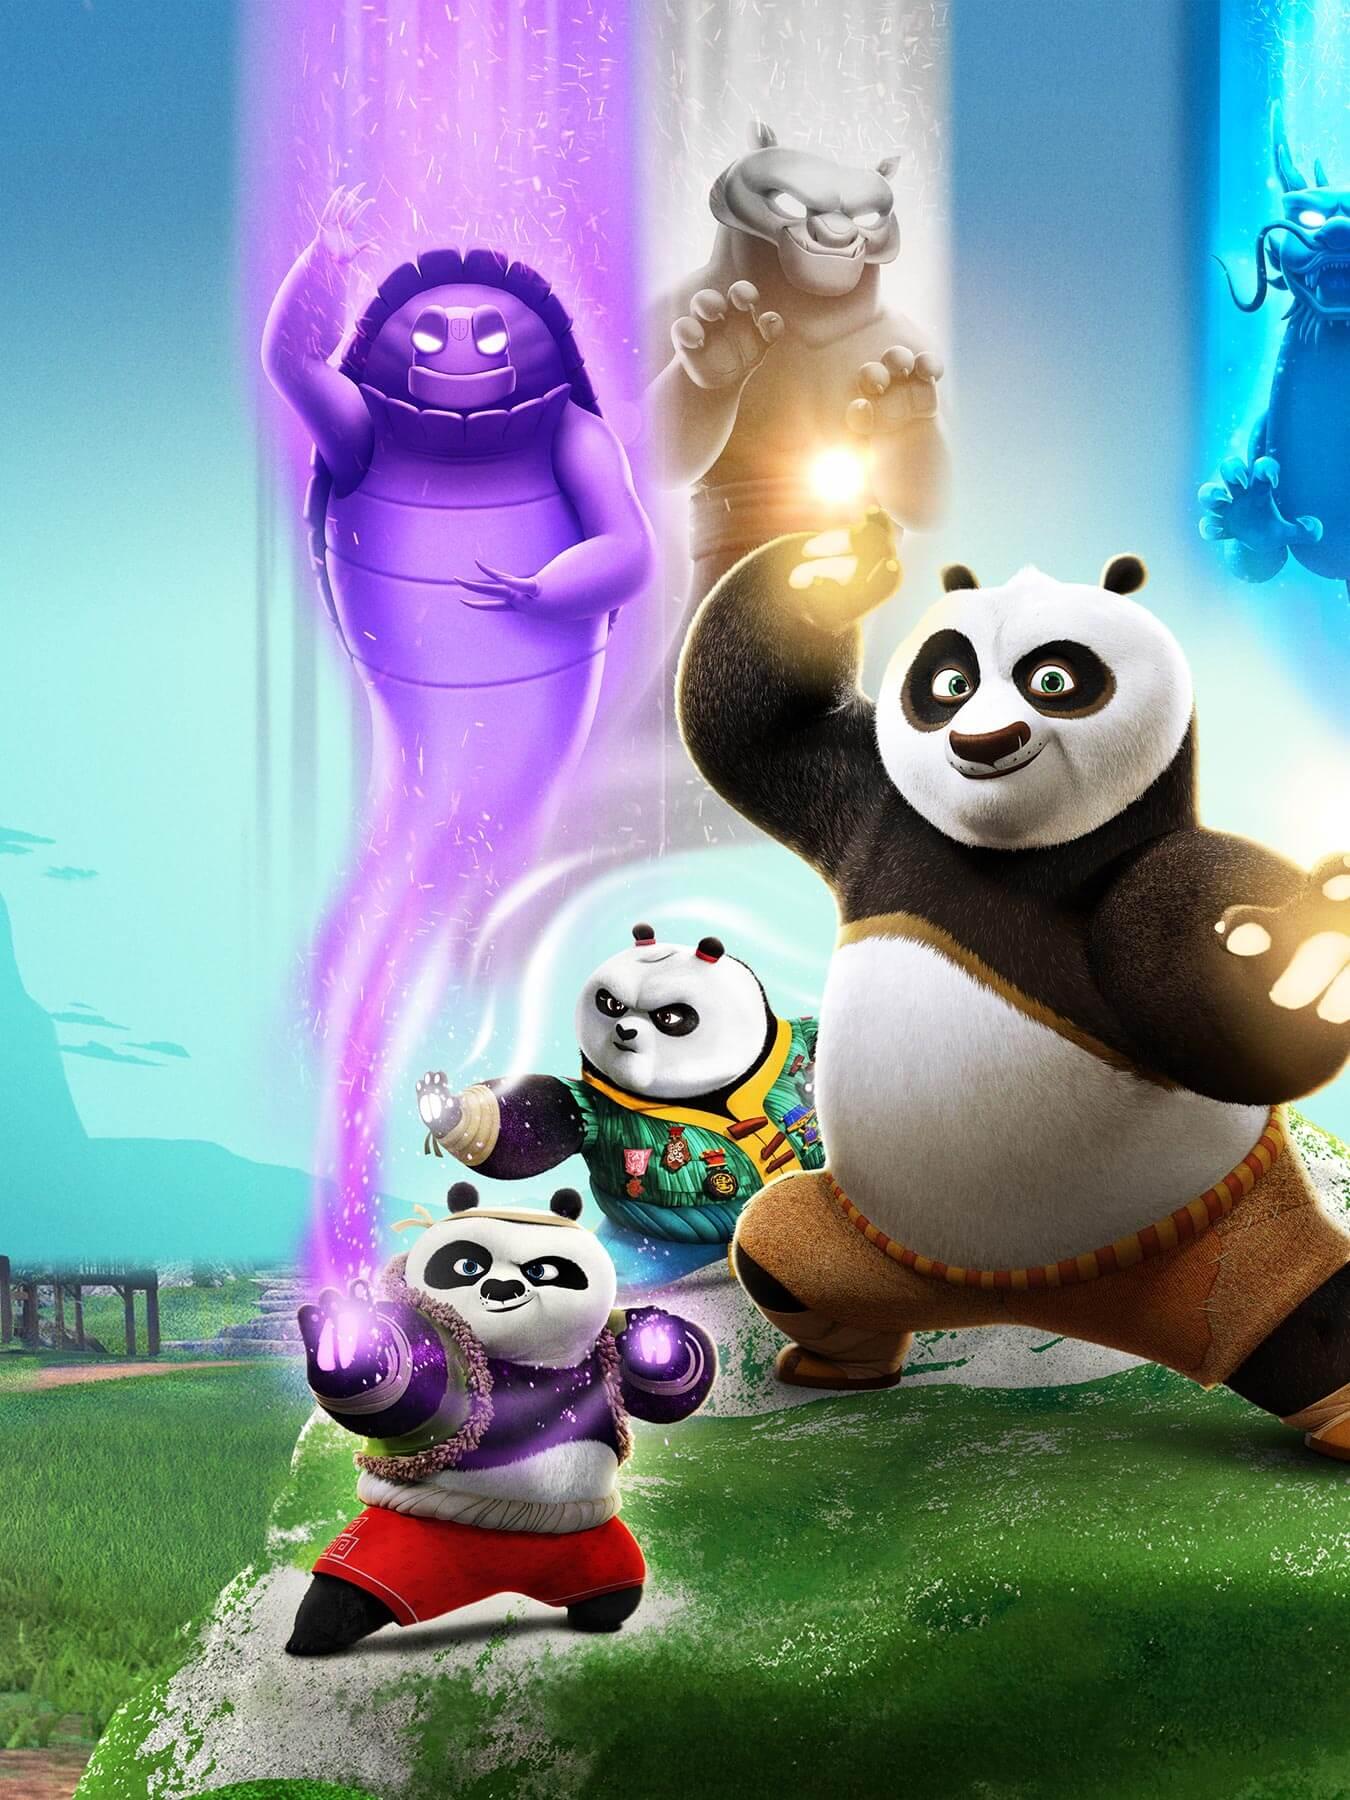 Kung Fu Panda The Paws Of Destiny Tv Shows Dreamworks